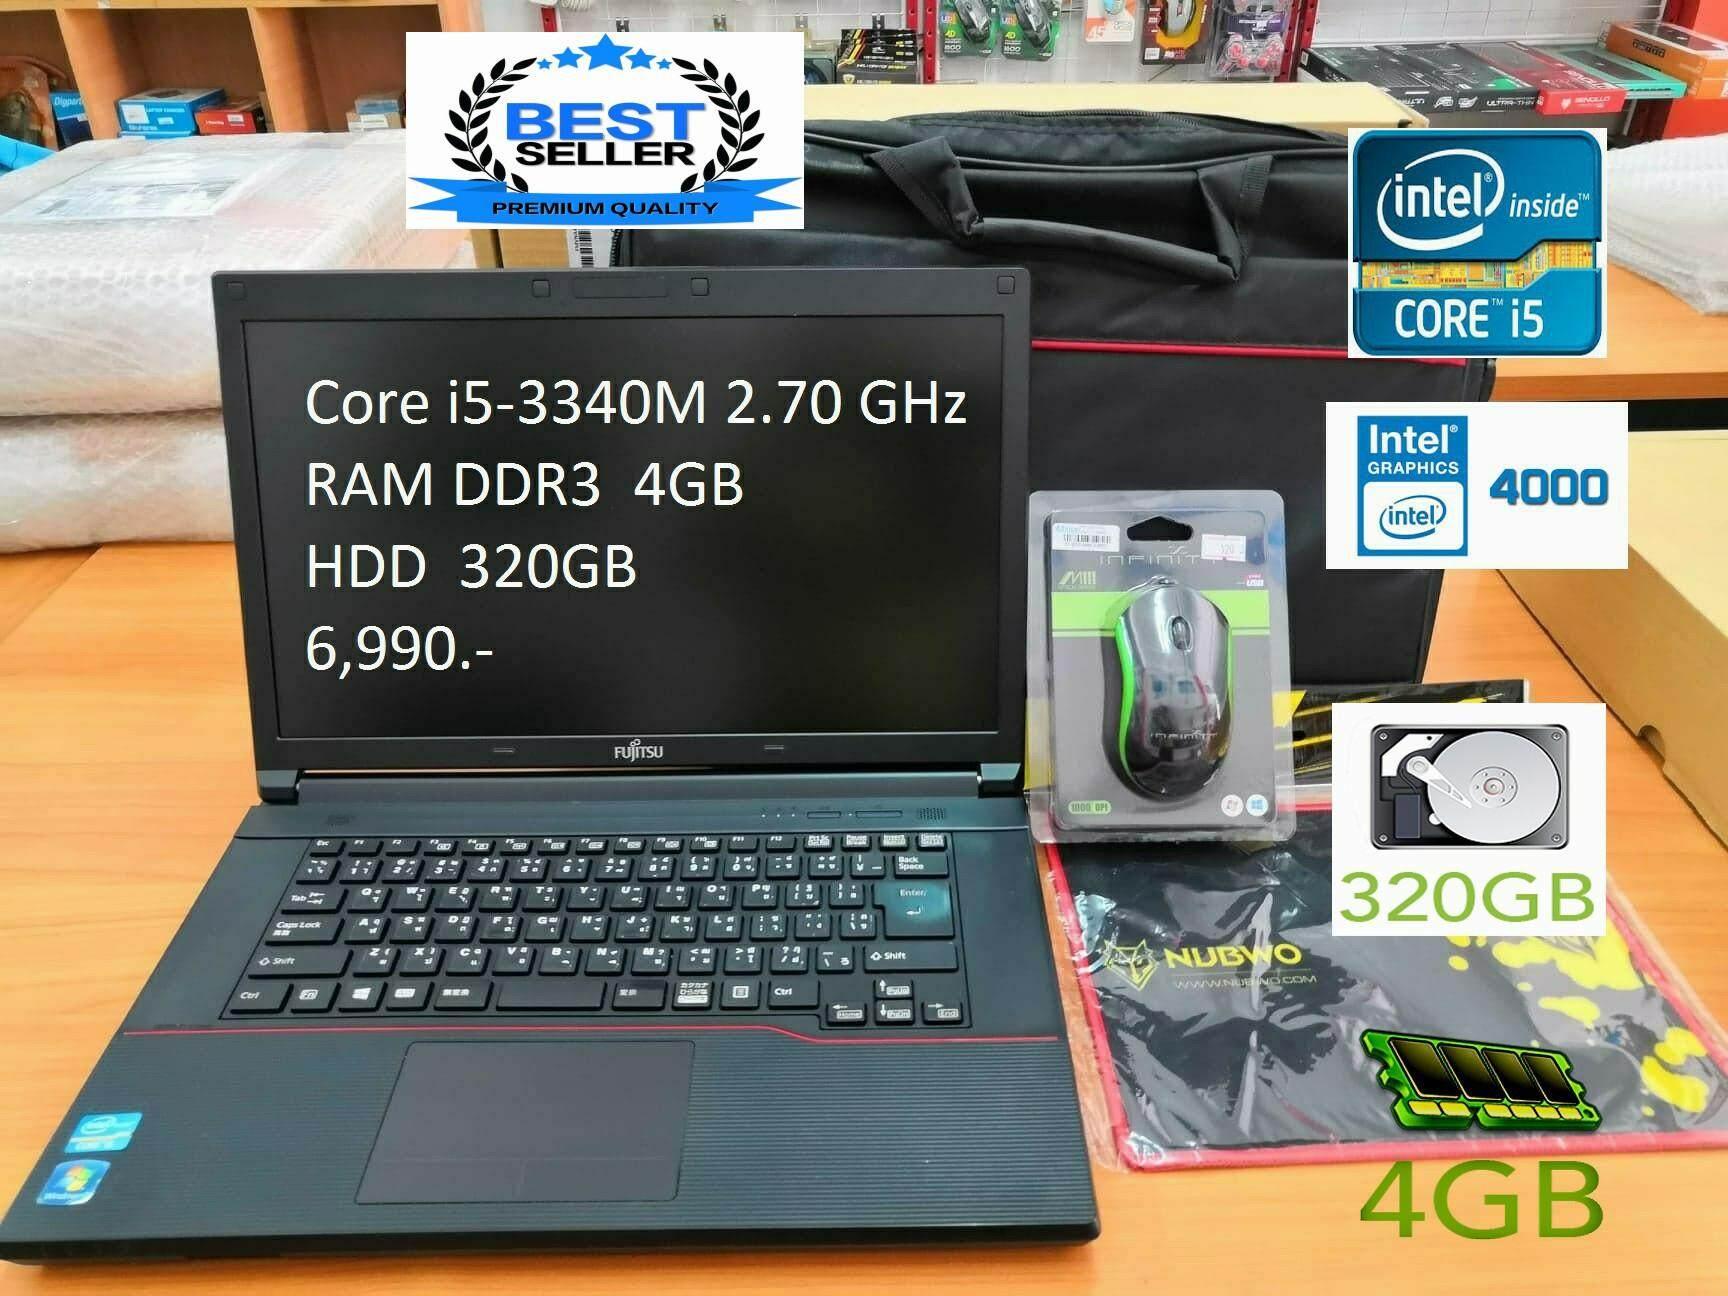 Notebook Fujitsu I5 Ram 4gb/hdd 320gb(ฟรีเกมส์ตามสั่ง)ไม่แยกคีย์ตัวเลข(gtav/pubg Lite/pb/hon/rov/fifa4/freefire/ragnarok M/pes/bf4/cs/the Sim 4)ทดสอบแล้วเล่นได้ By Saby Computer.